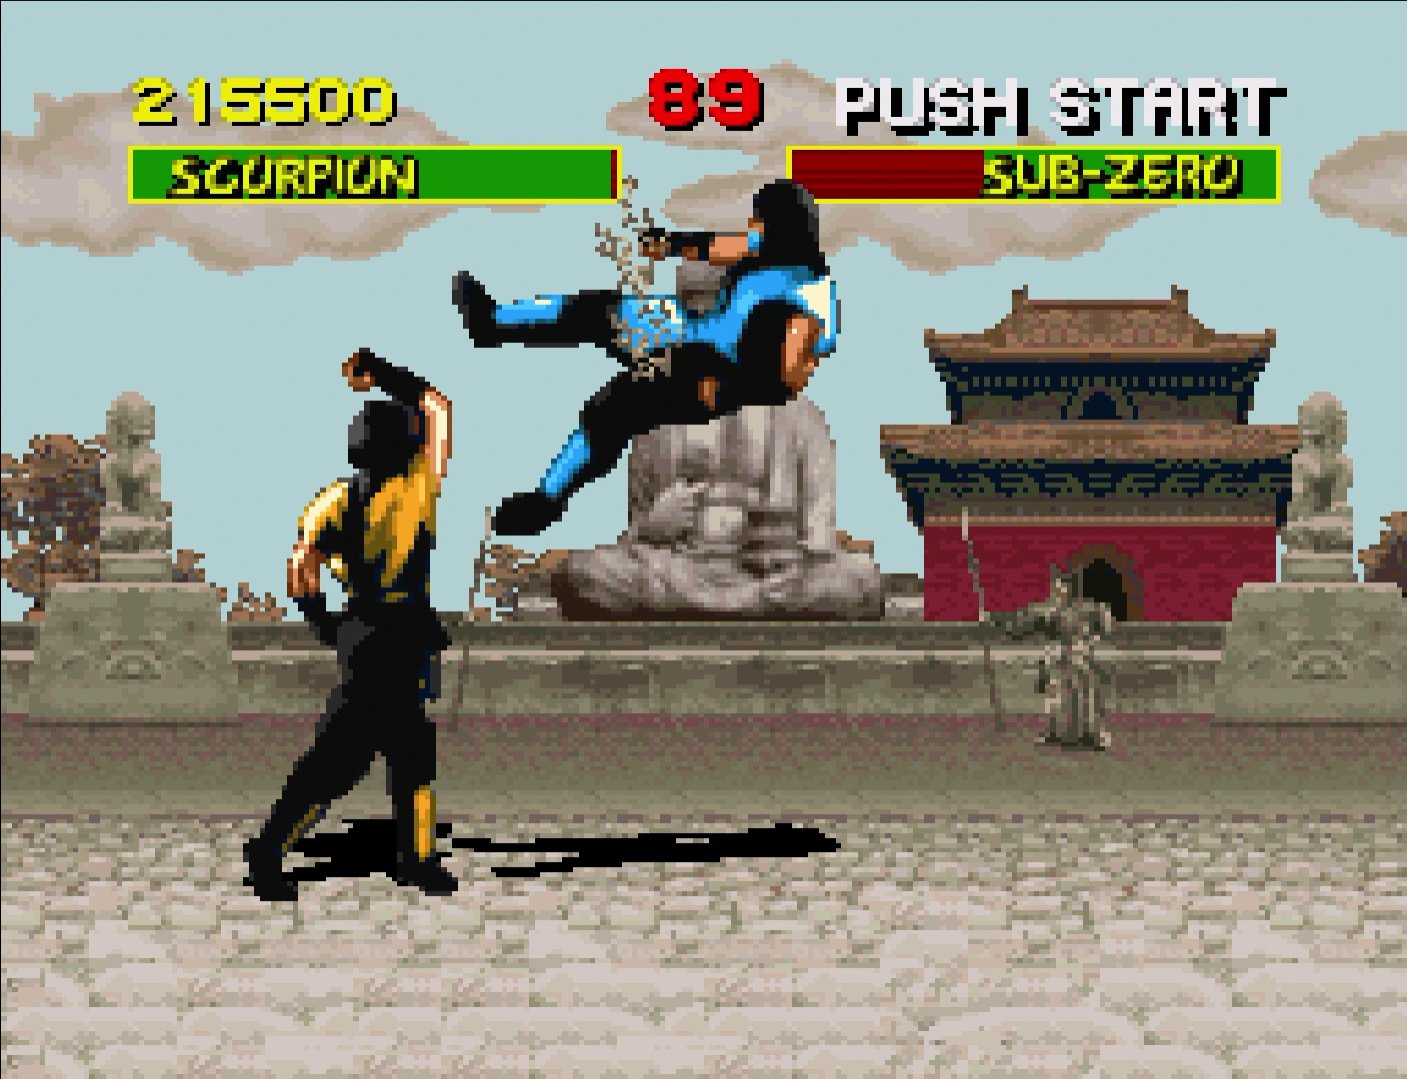 How Mortal Kombat Defined The Console War Between Sega And Nintendo